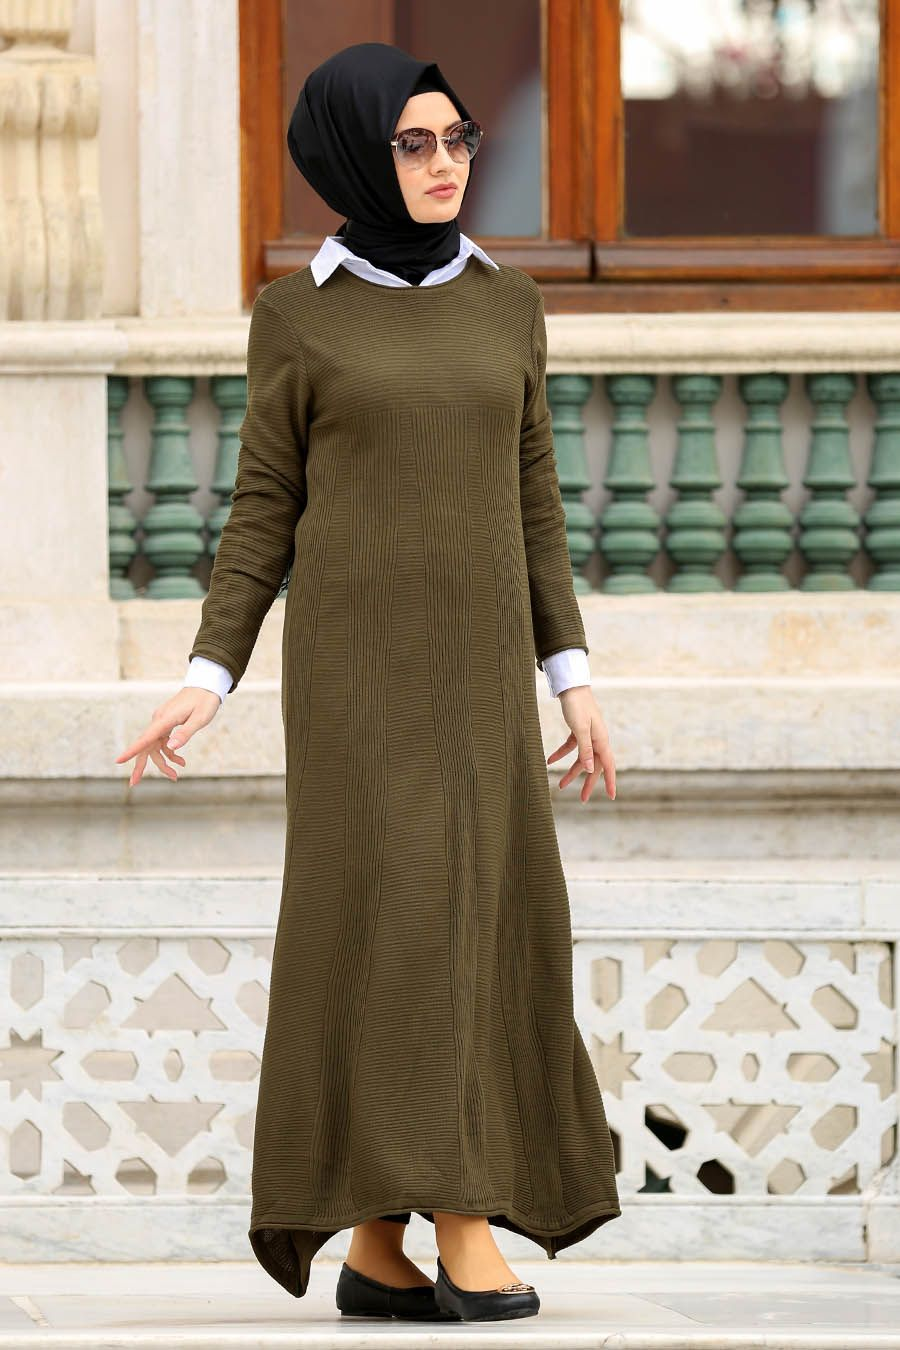 Modaselvim Elbise Kolyeli Triko Tesettur Elbise 5047ef311 Kiremit Tesettur T Harika Model Elbise Triko The Dress